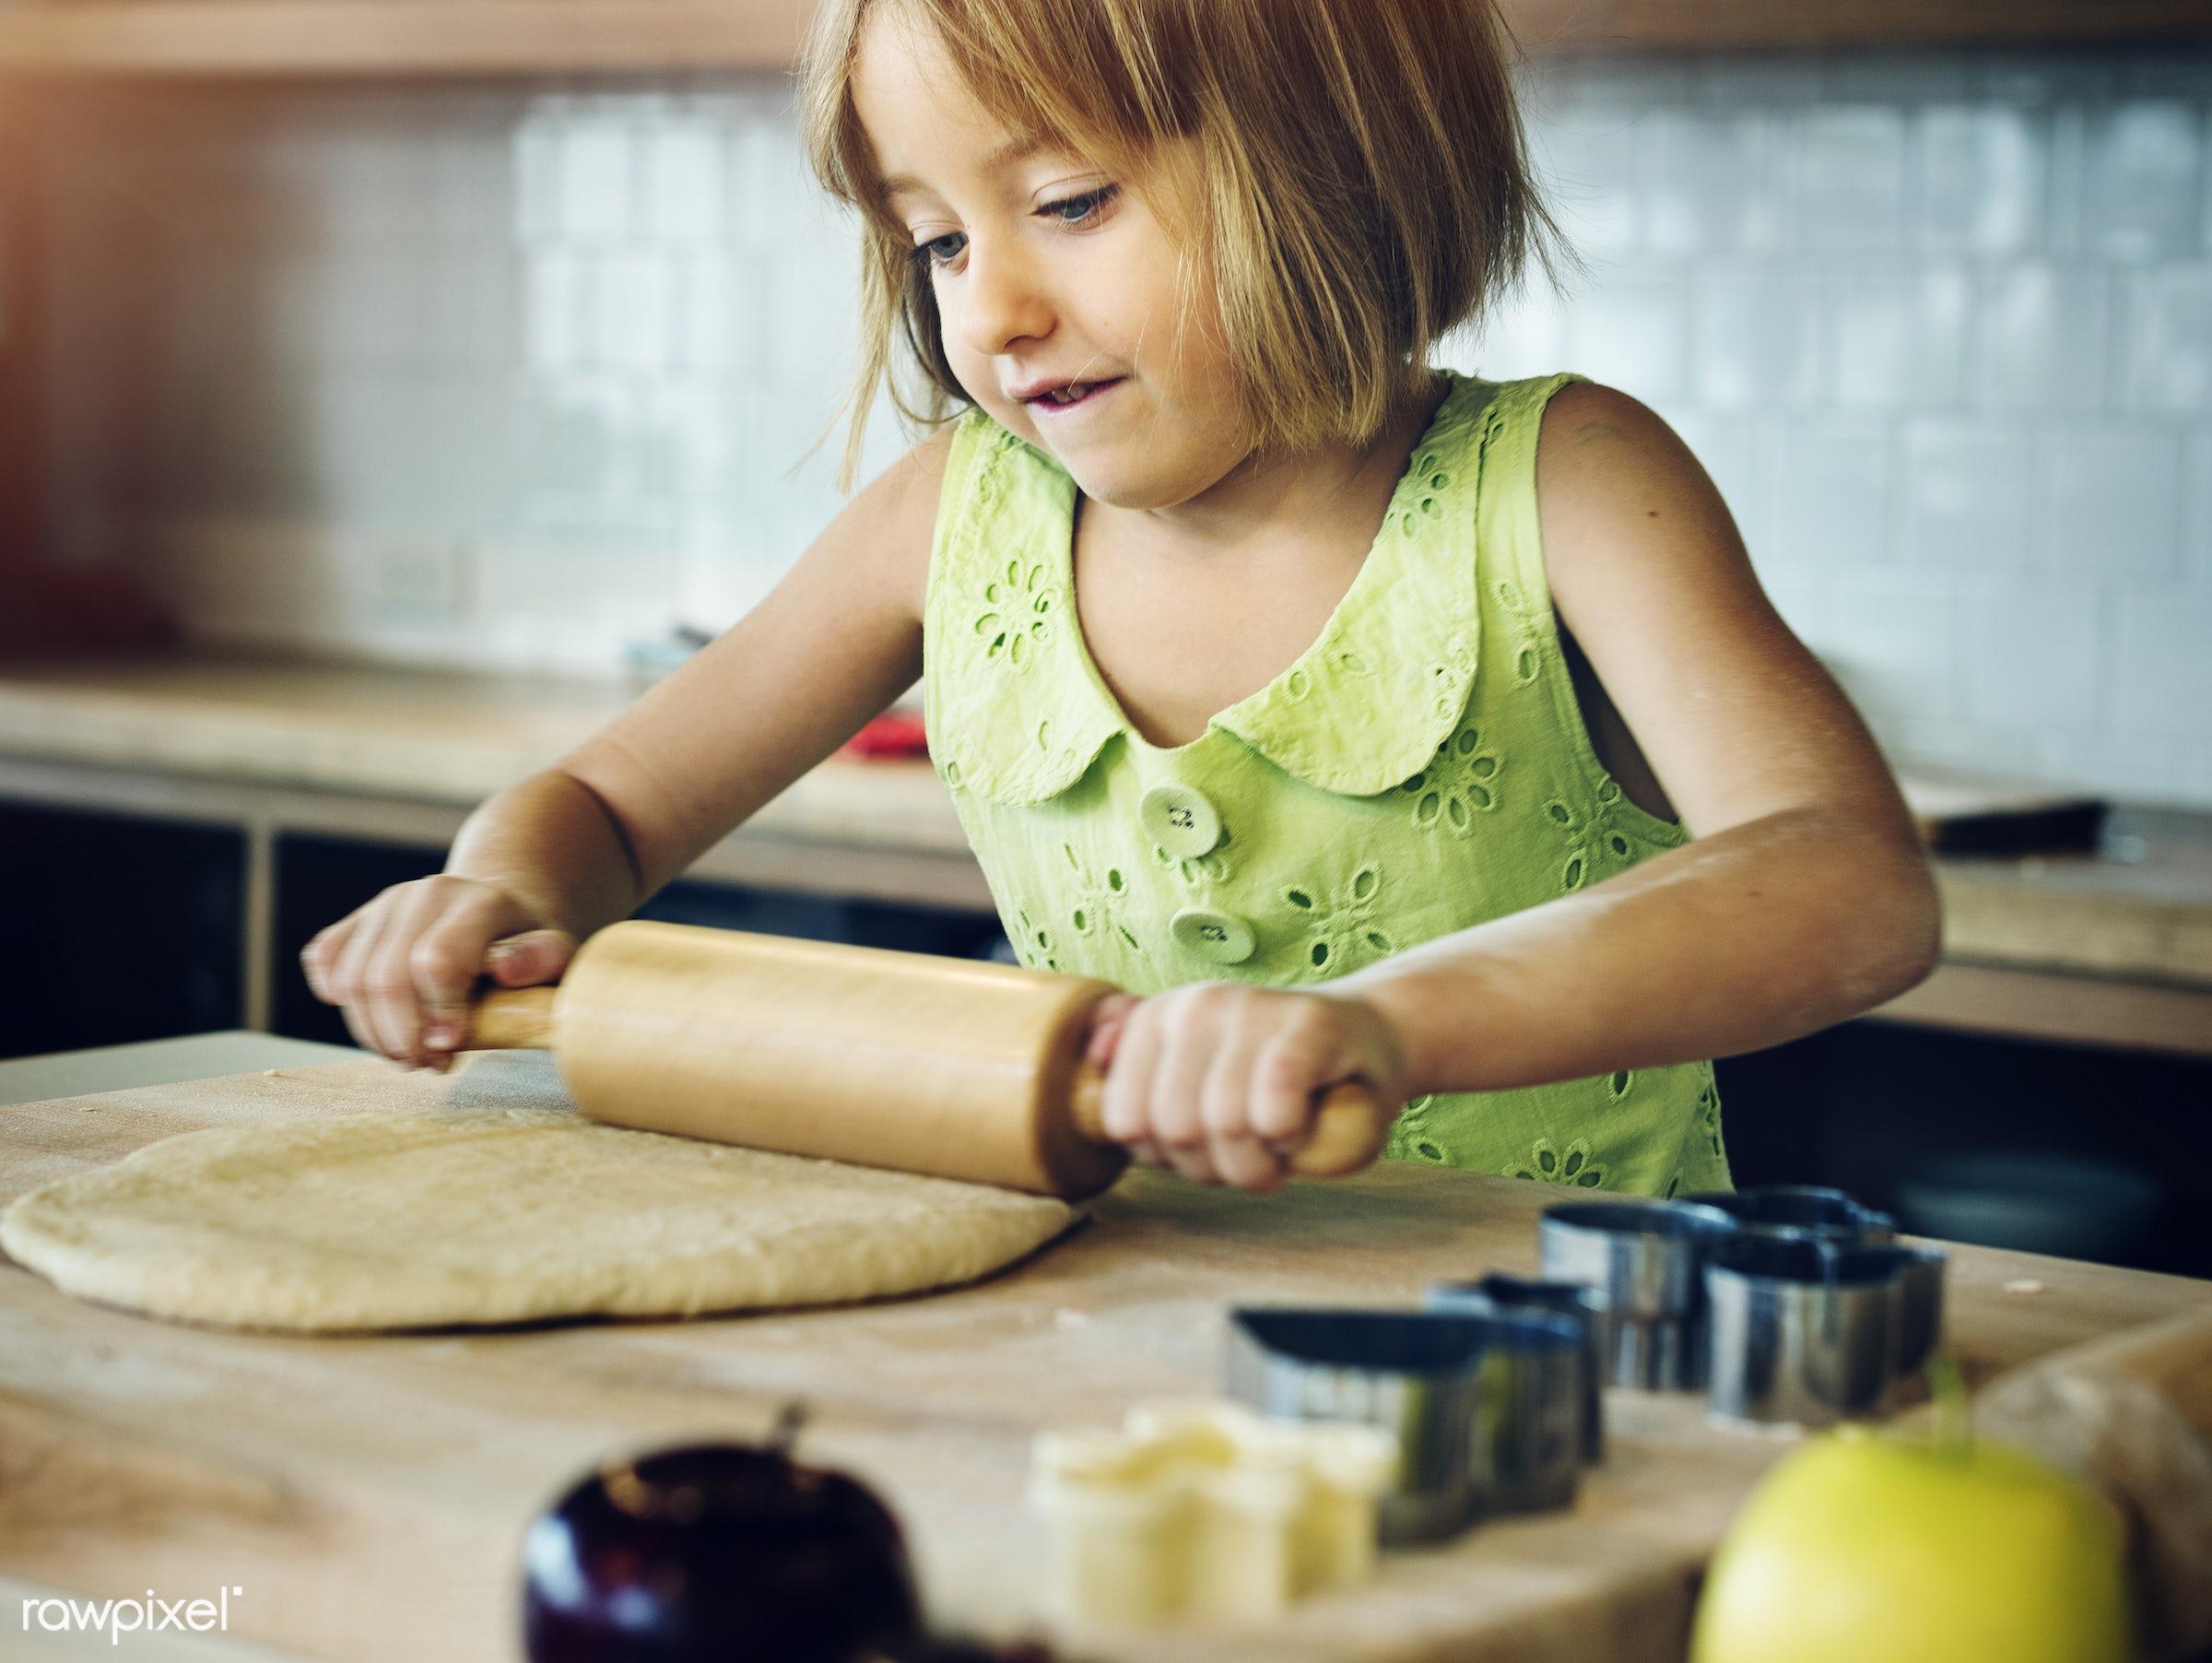 activity, alone, american, bake, baker, bakery, baking, blond, caucasian, cheerful, child, cook, cookies, daughter, dessert...